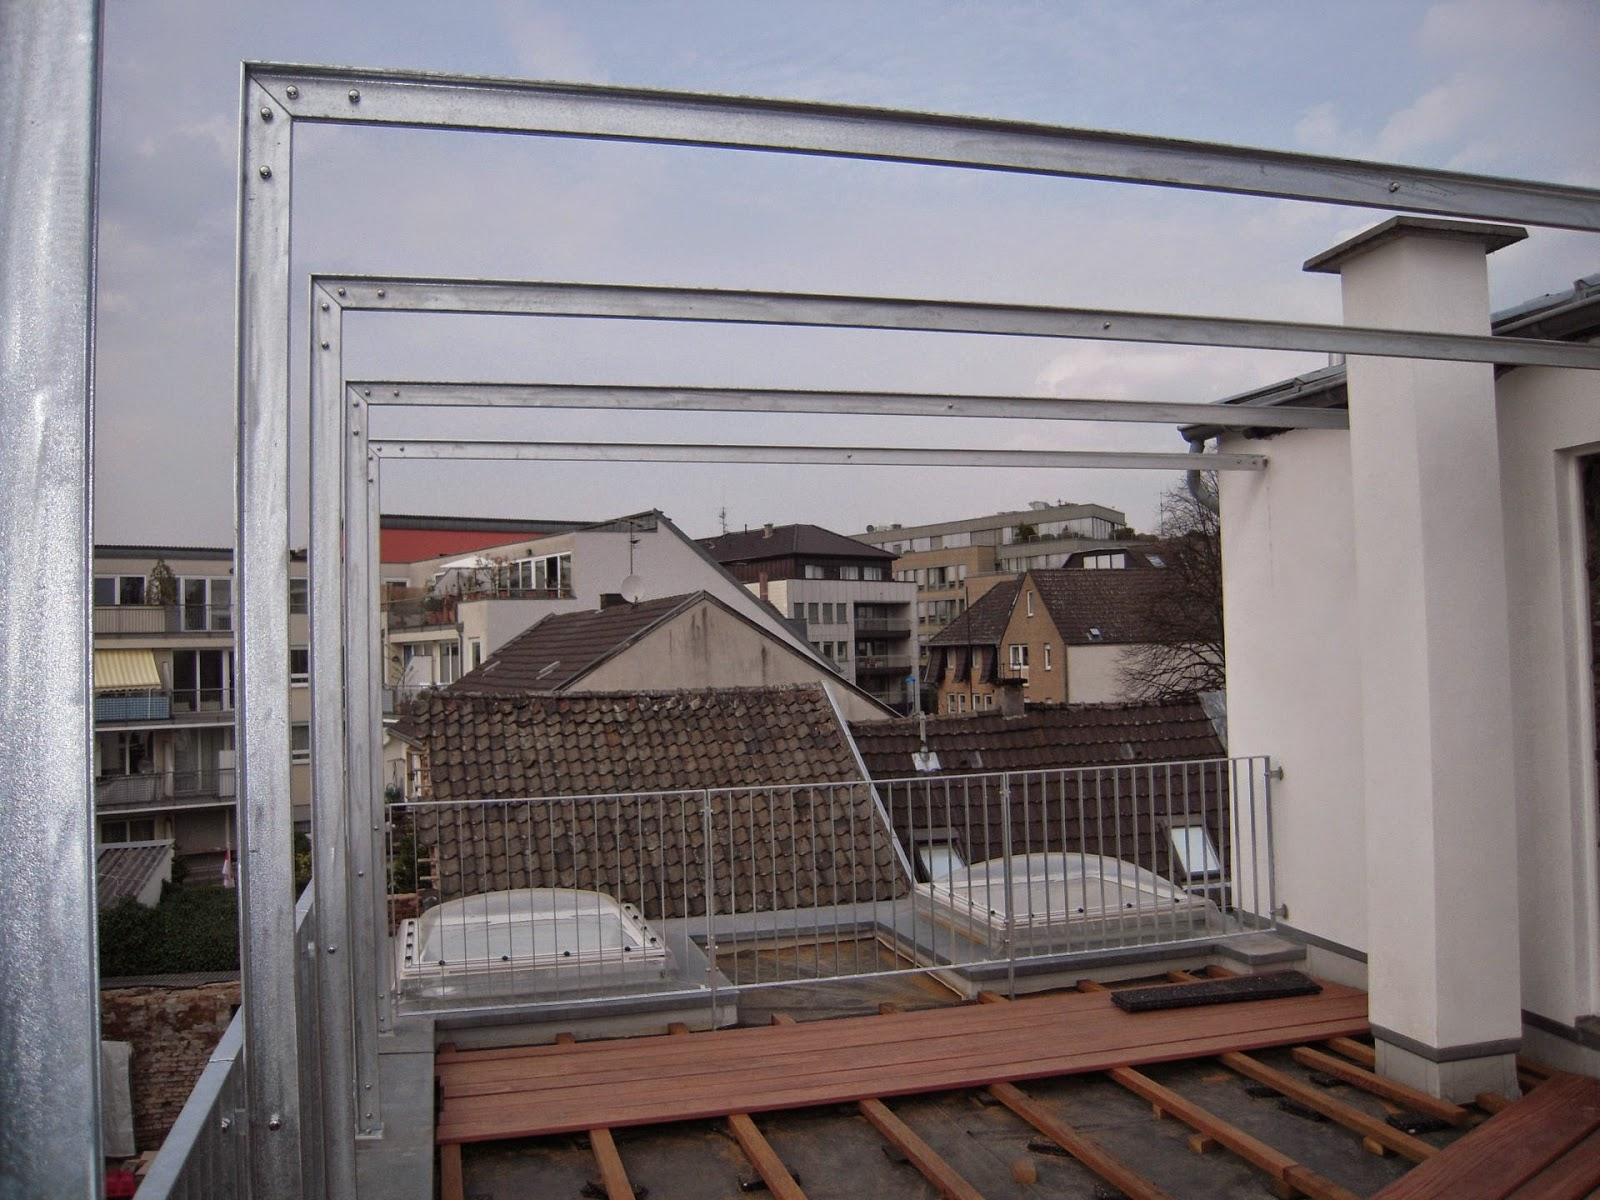 fr bel metallbau stahlpergola fenstergitter und terrassengitter montiert. Black Bedroom Furniture Sets. Home Design Ideas